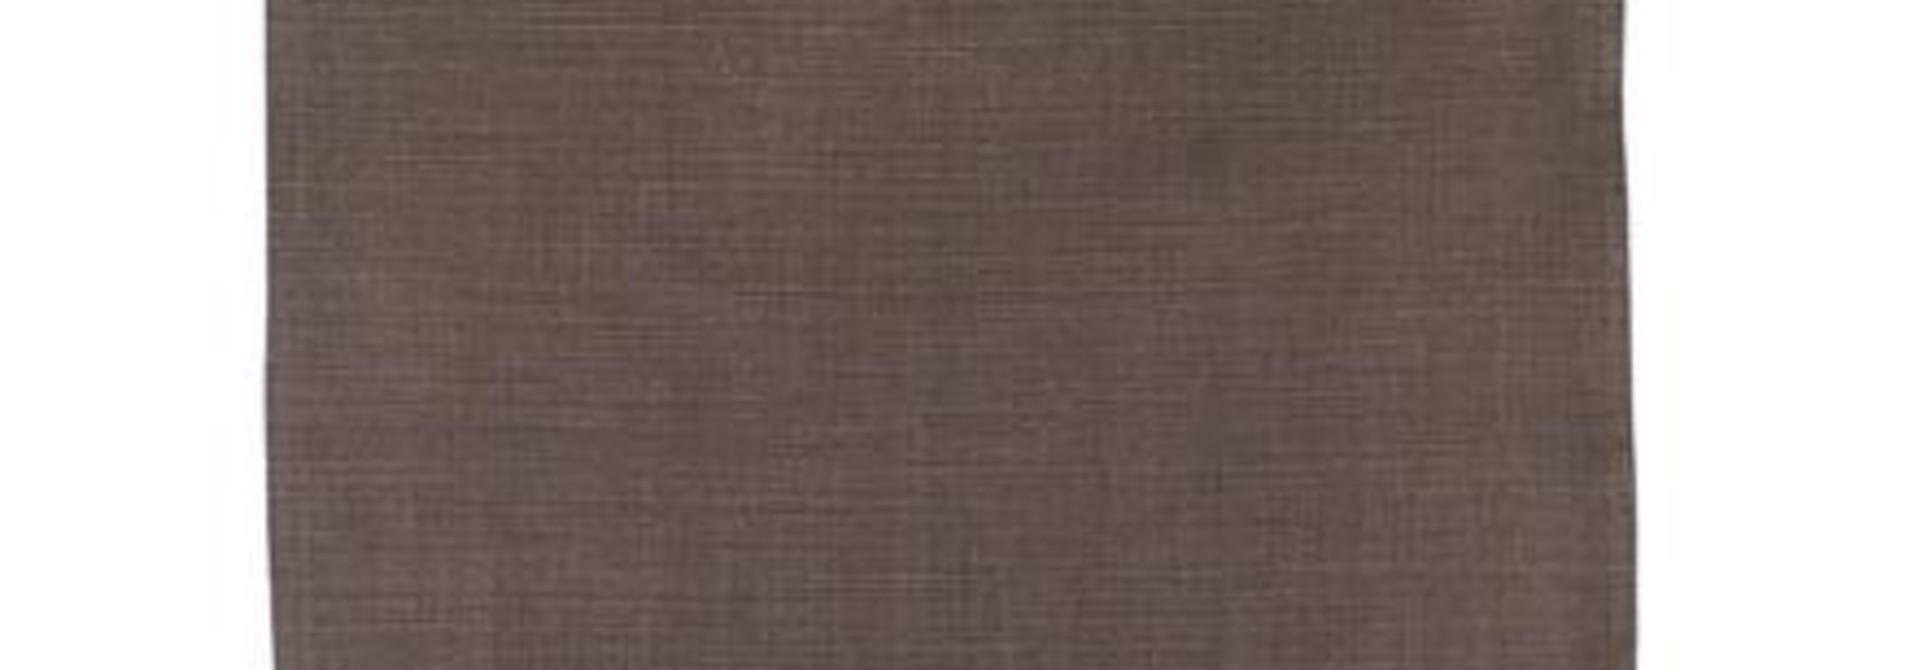 Tablecloth -Vence - Cafe Noir - Sz Med.